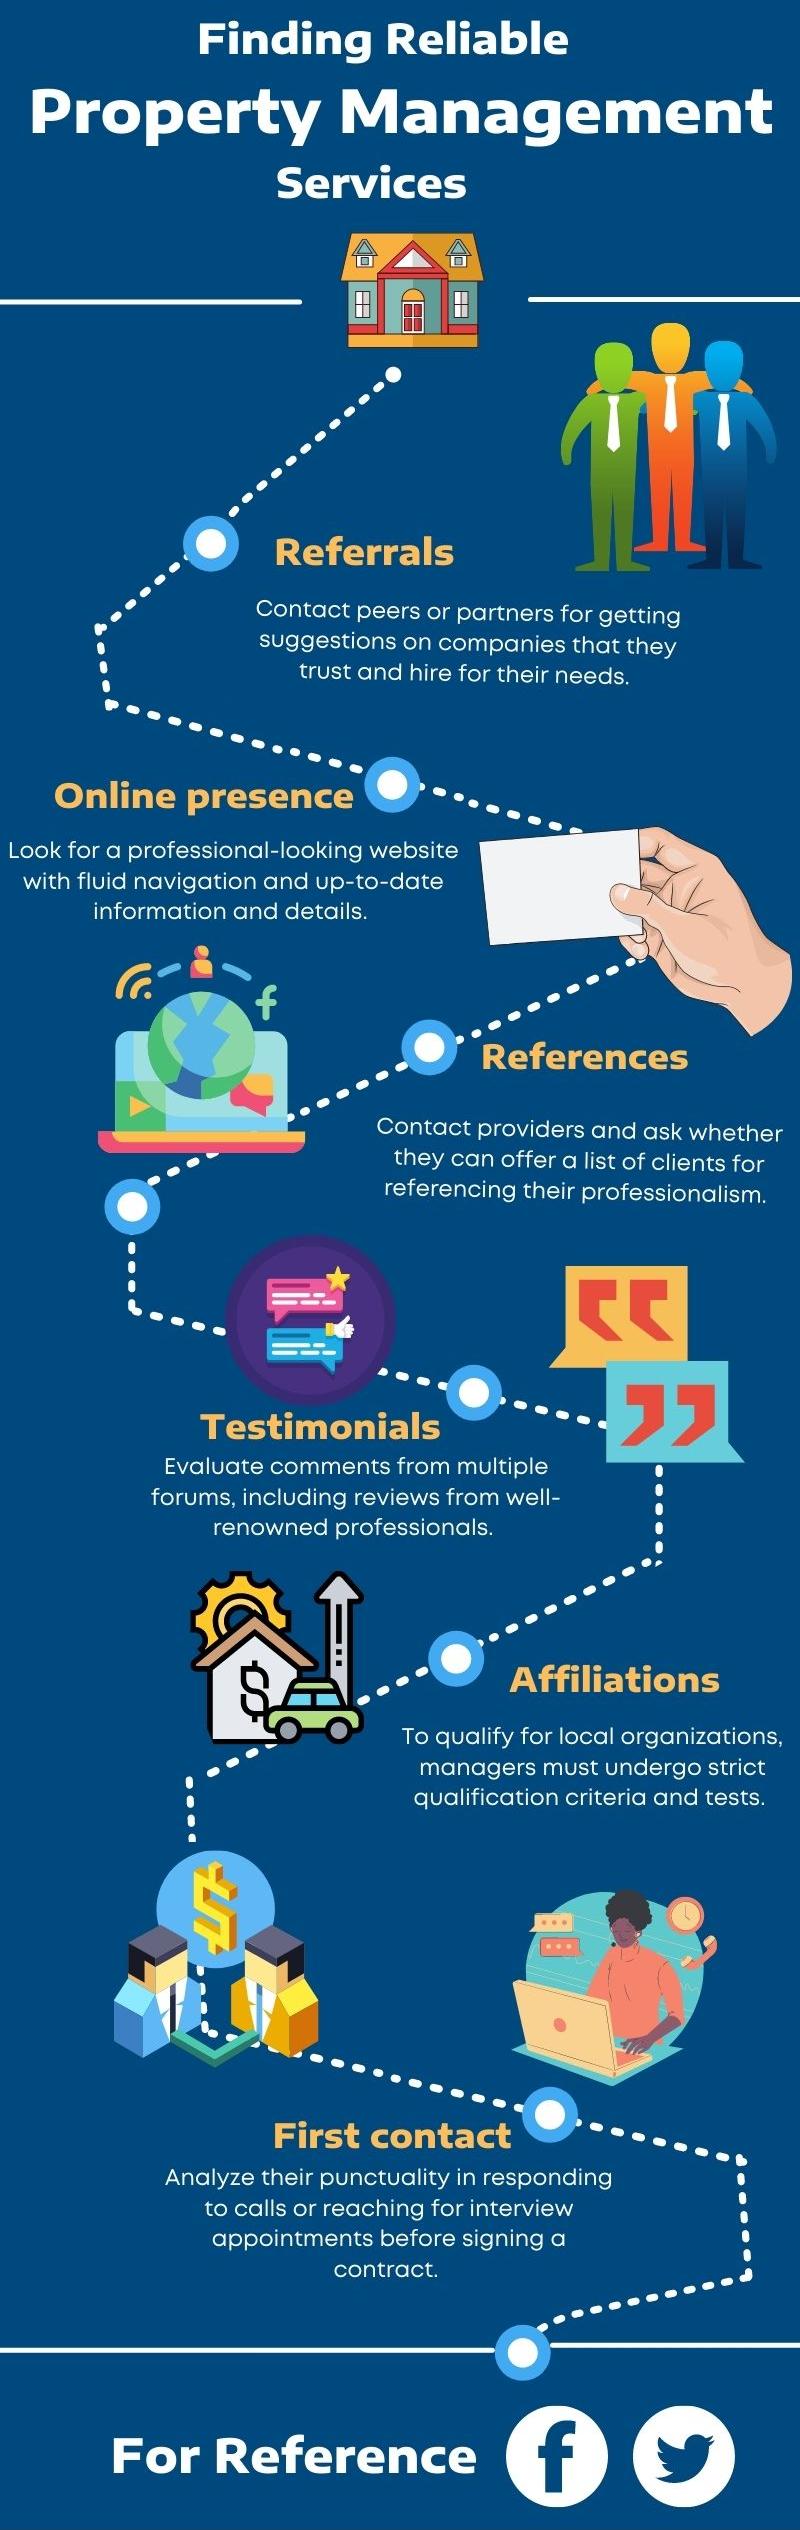 Basics of a Good Property Management Services